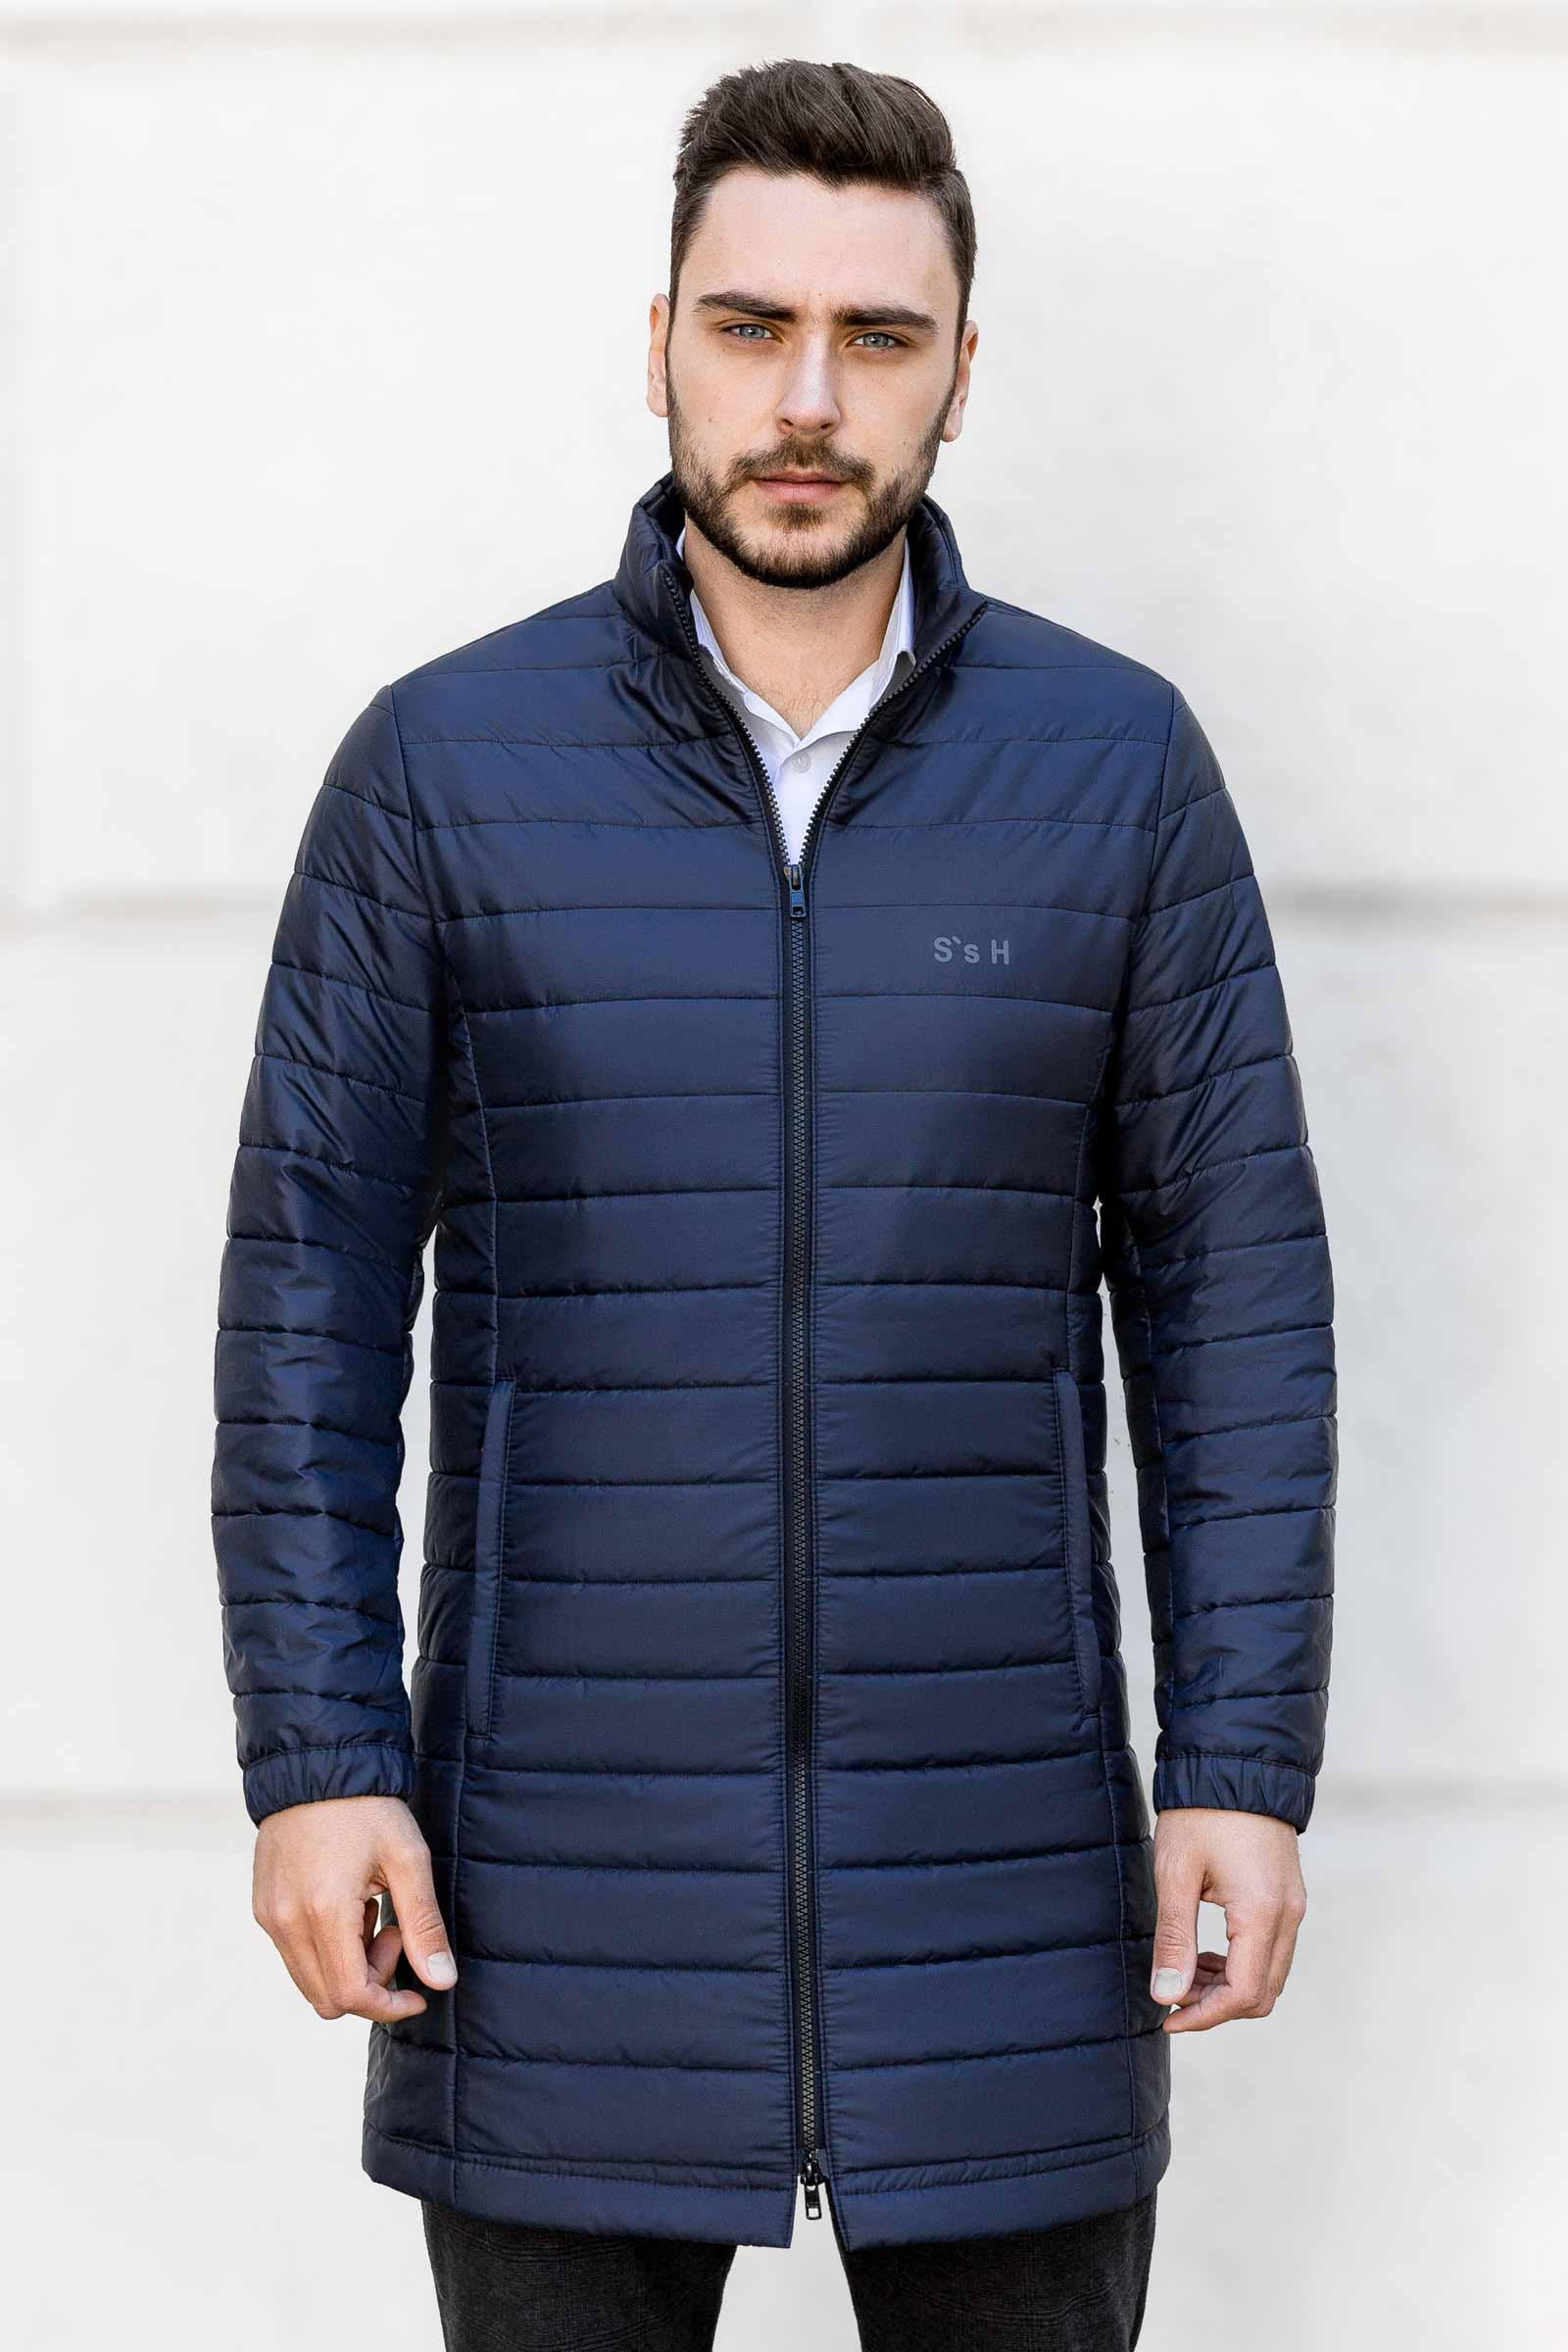 Весенняя мужская куртка Запорожье - фото